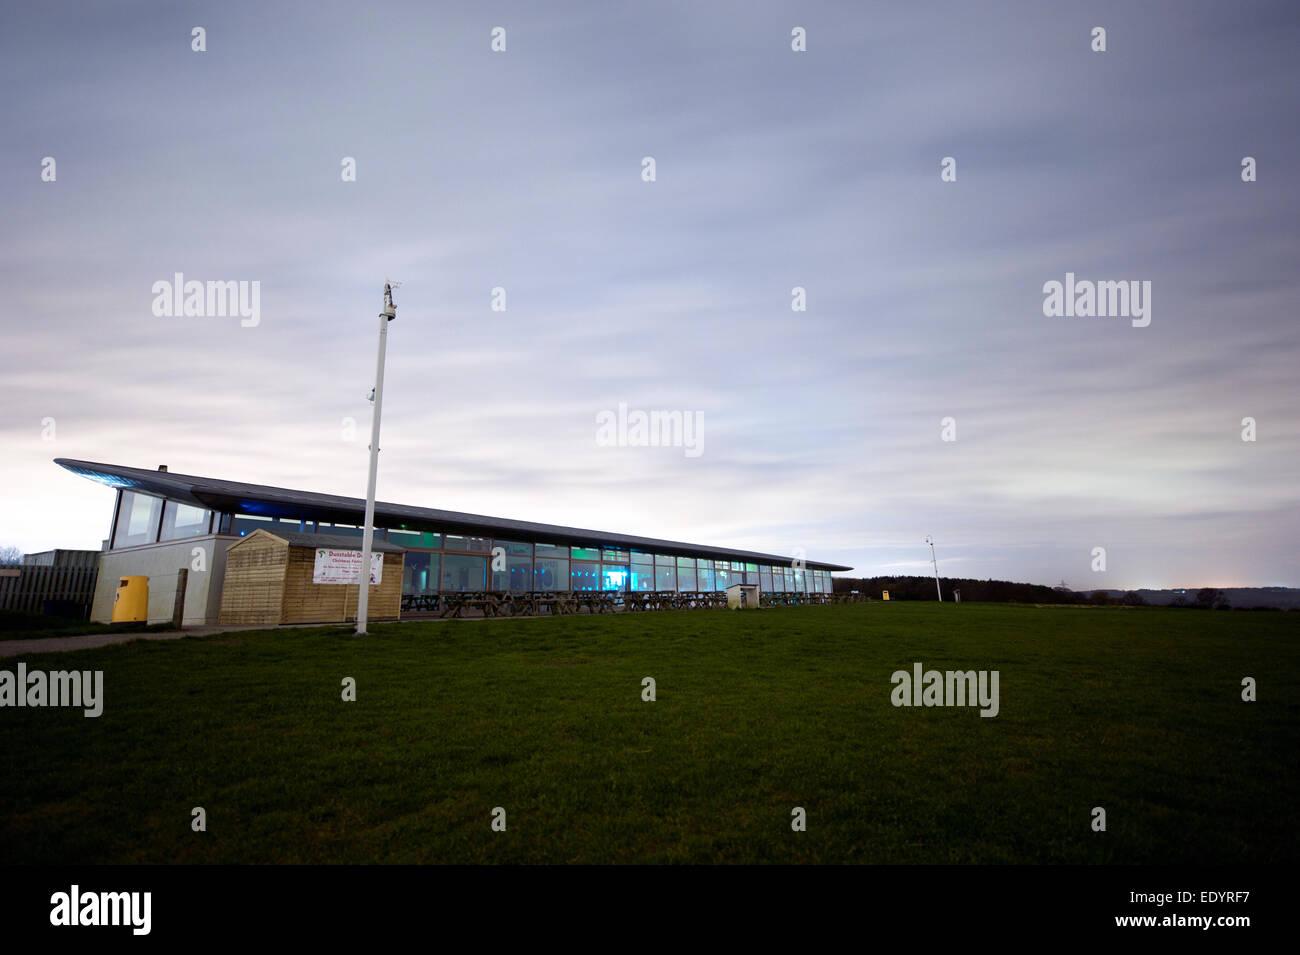 dunstable downs visitors center. credit: LEE RAMSDEN / ALAMY - Stock Image